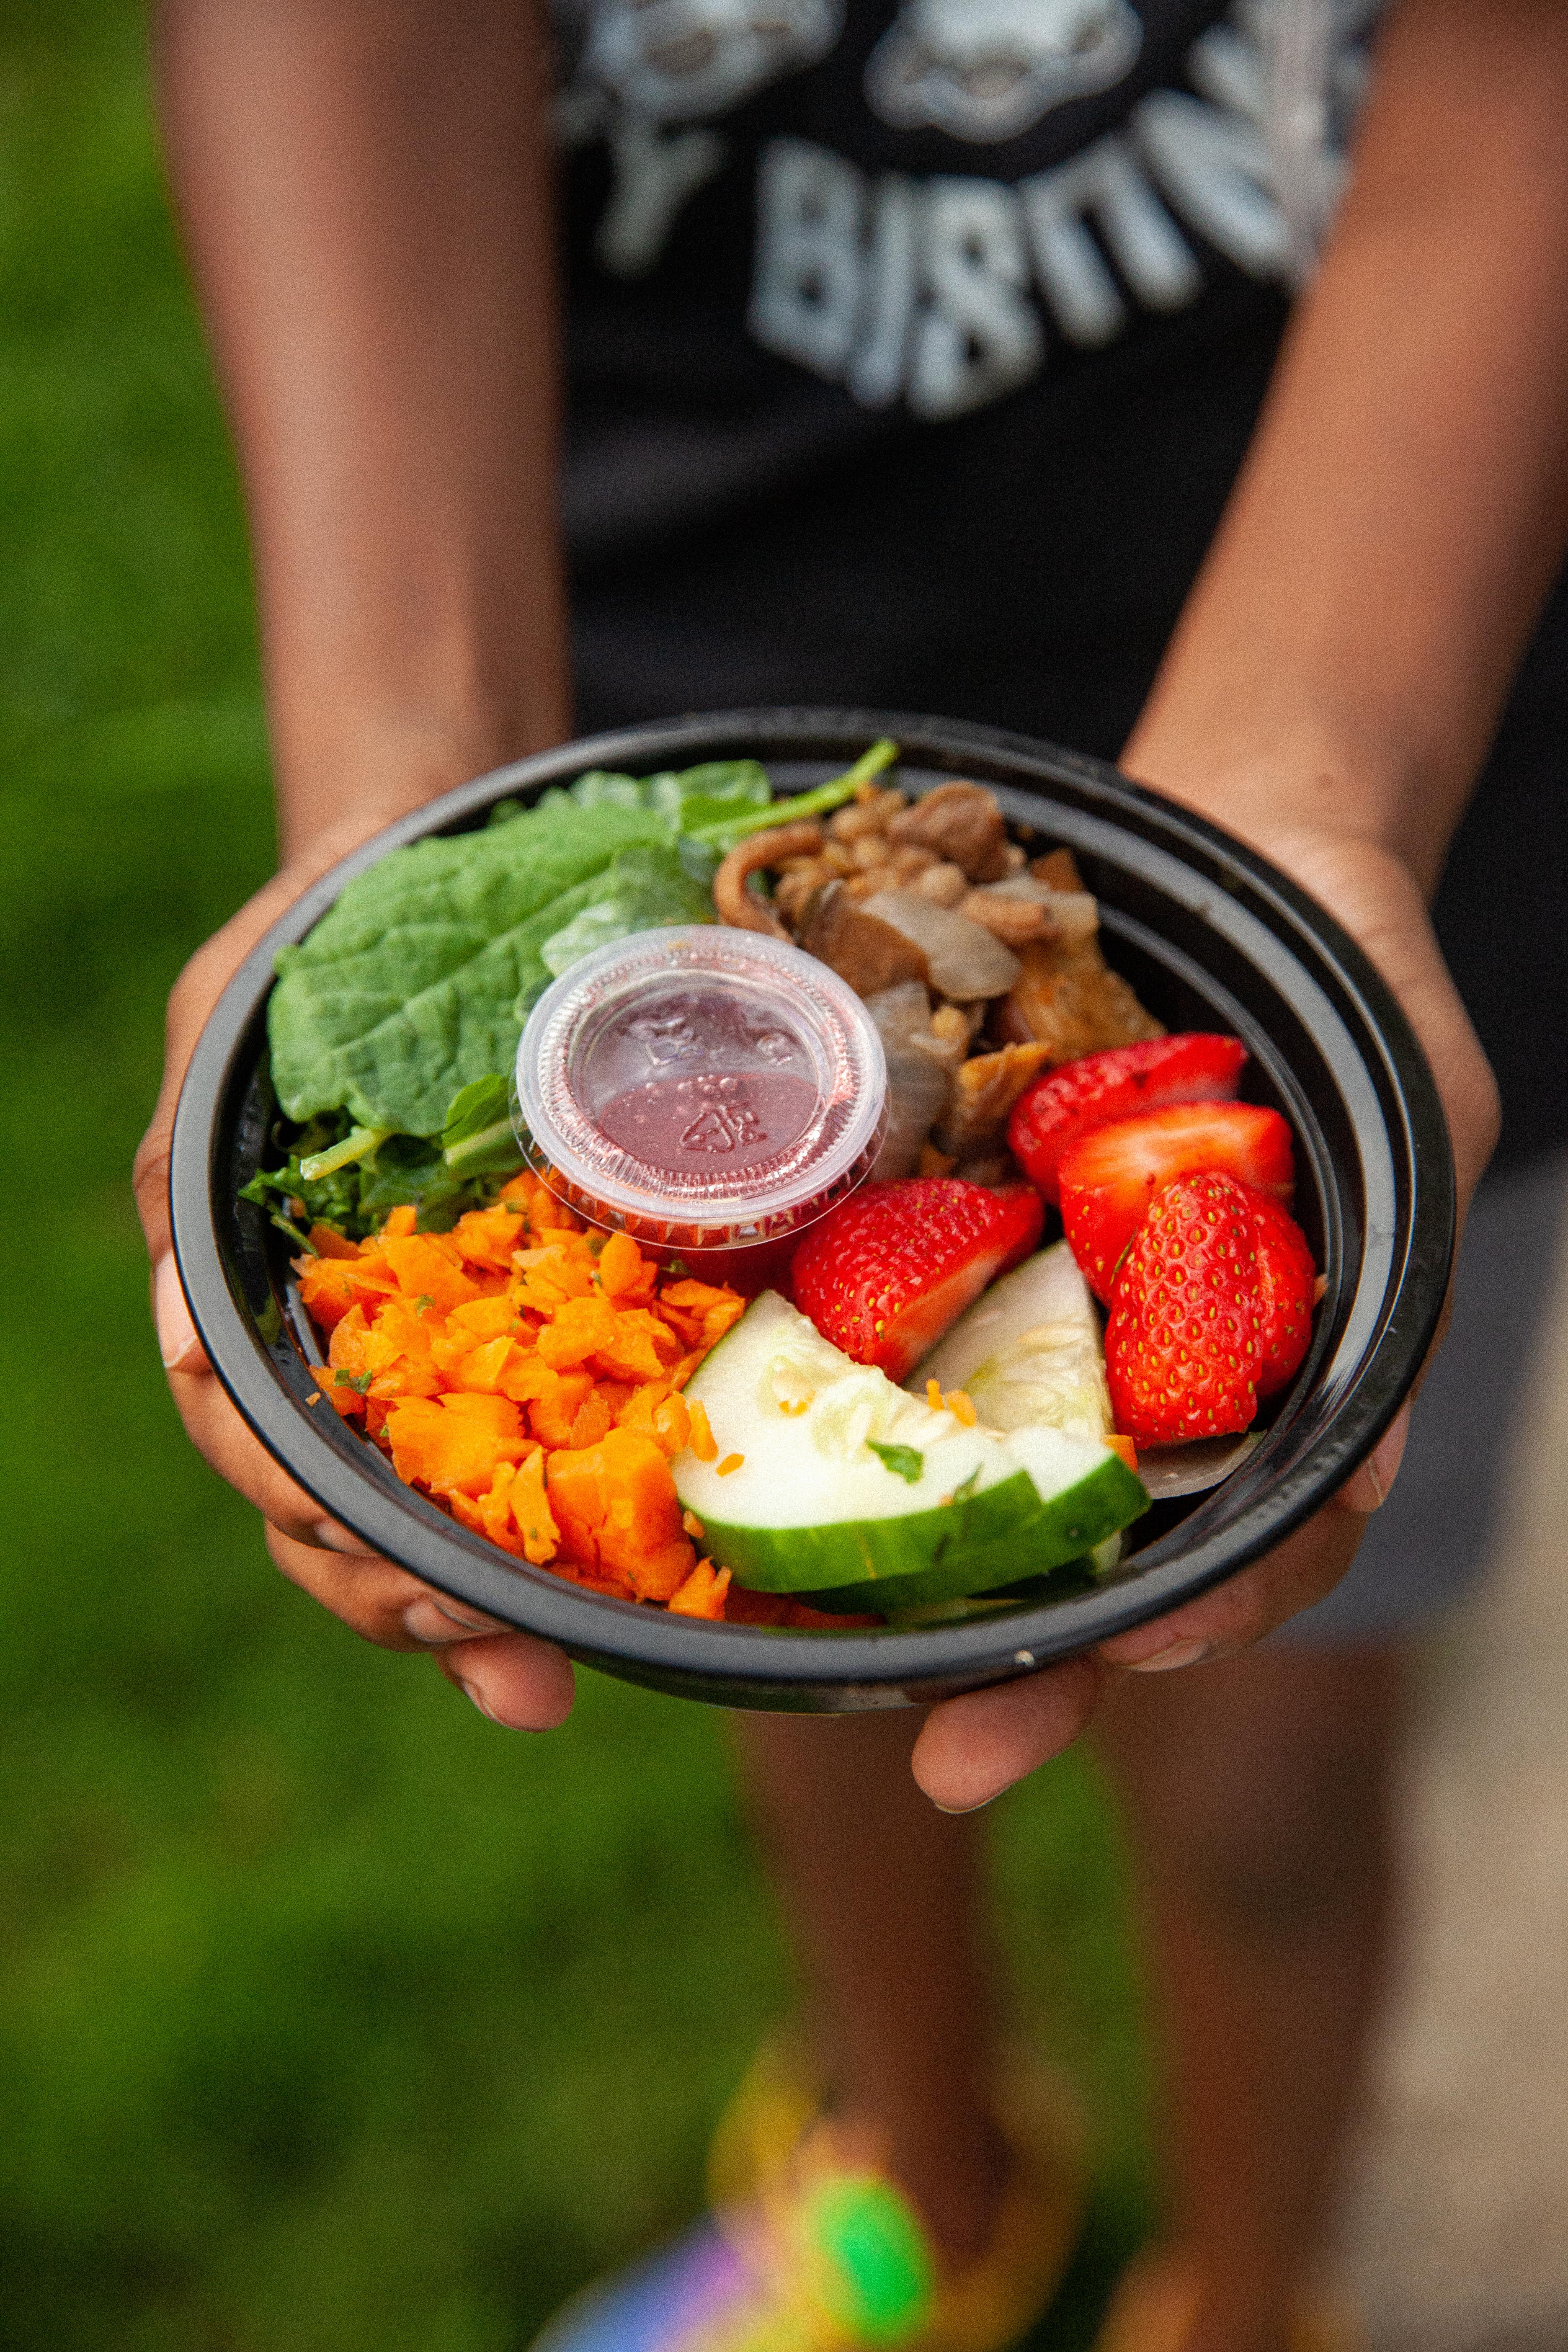 Kj holding salad